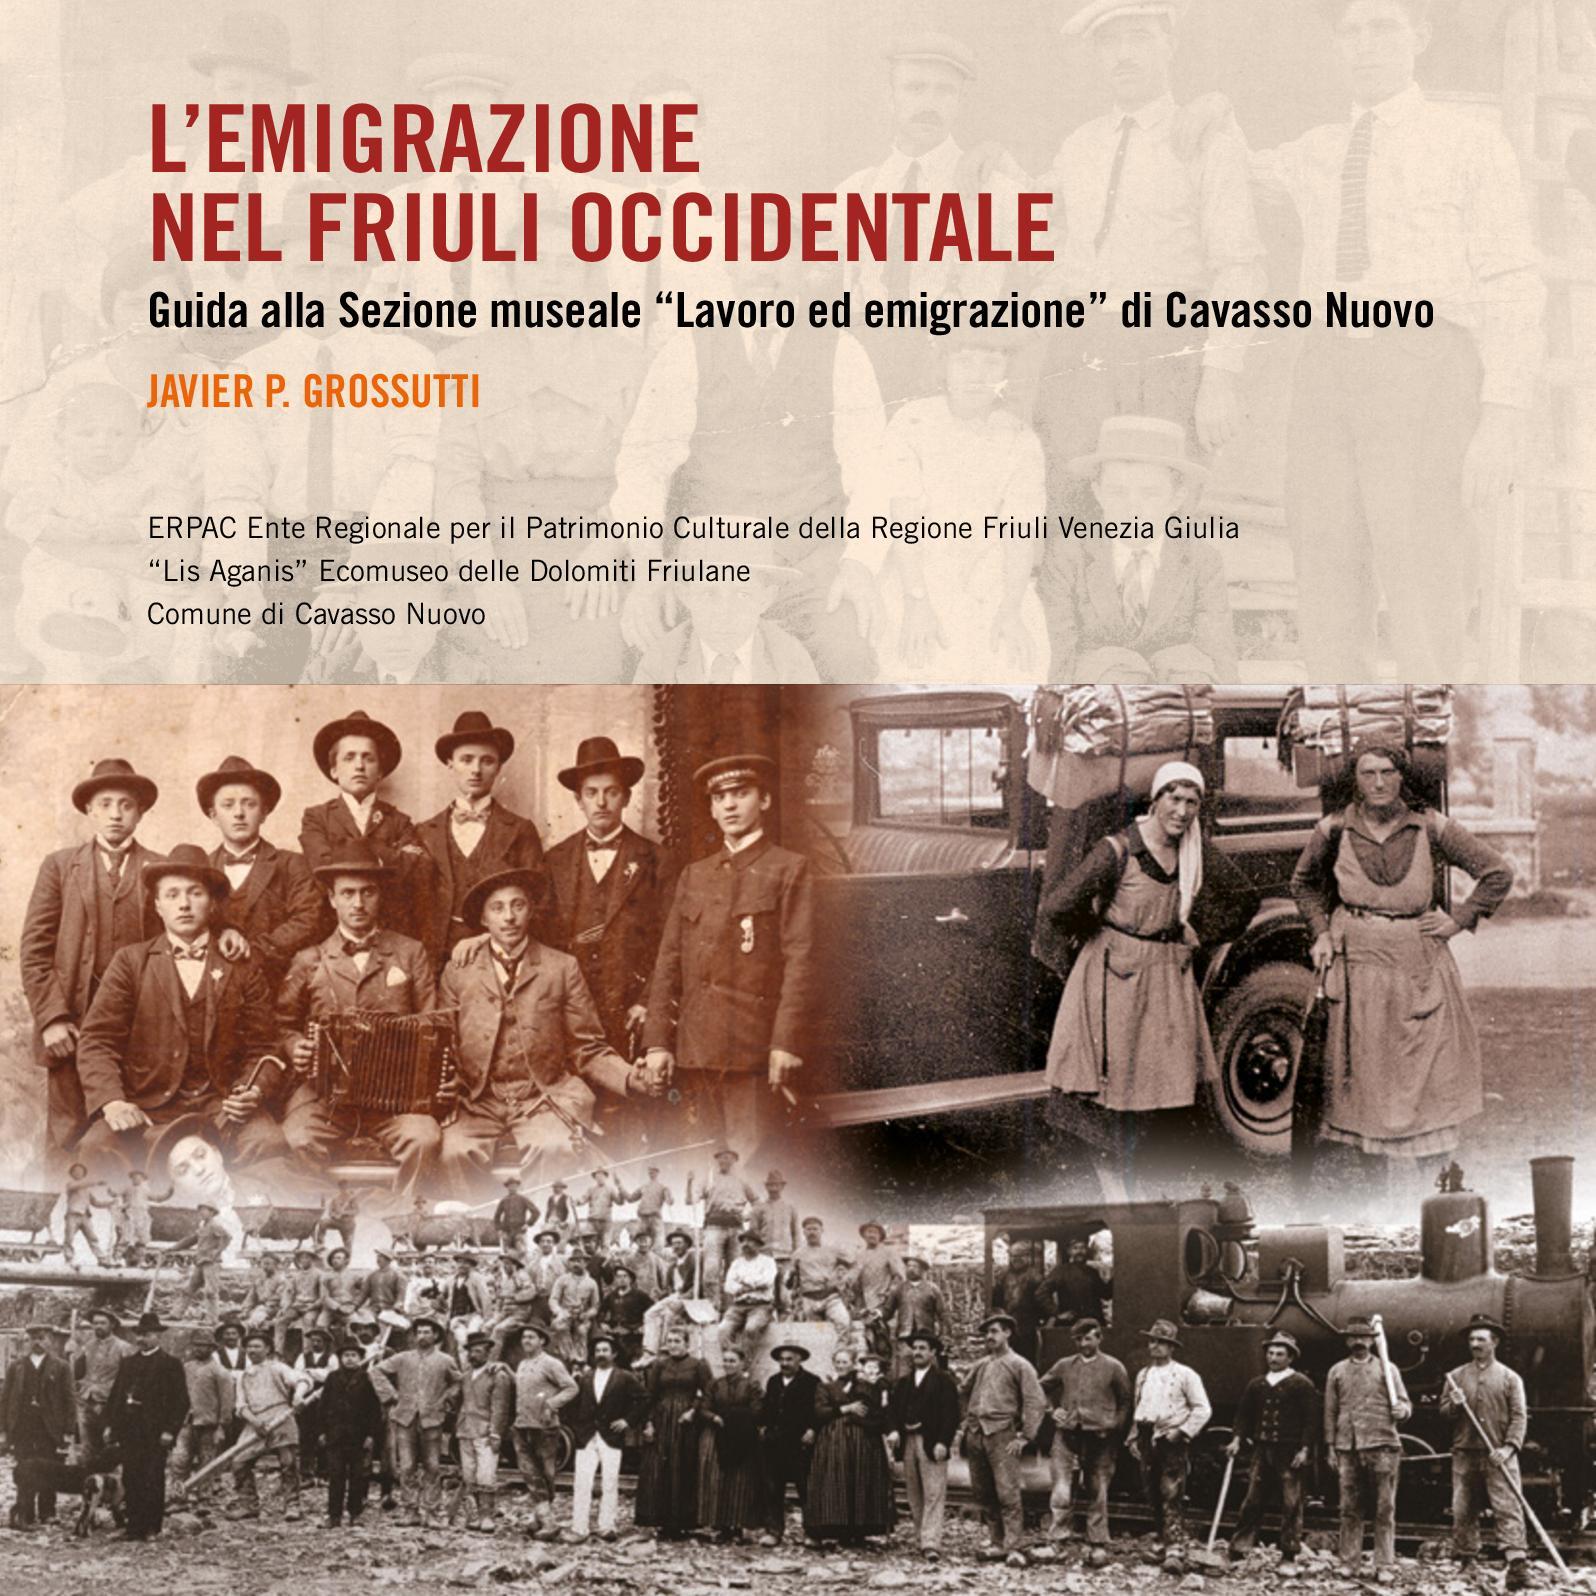 Calaméo Lemigrazione Nel Friuli Occidentale